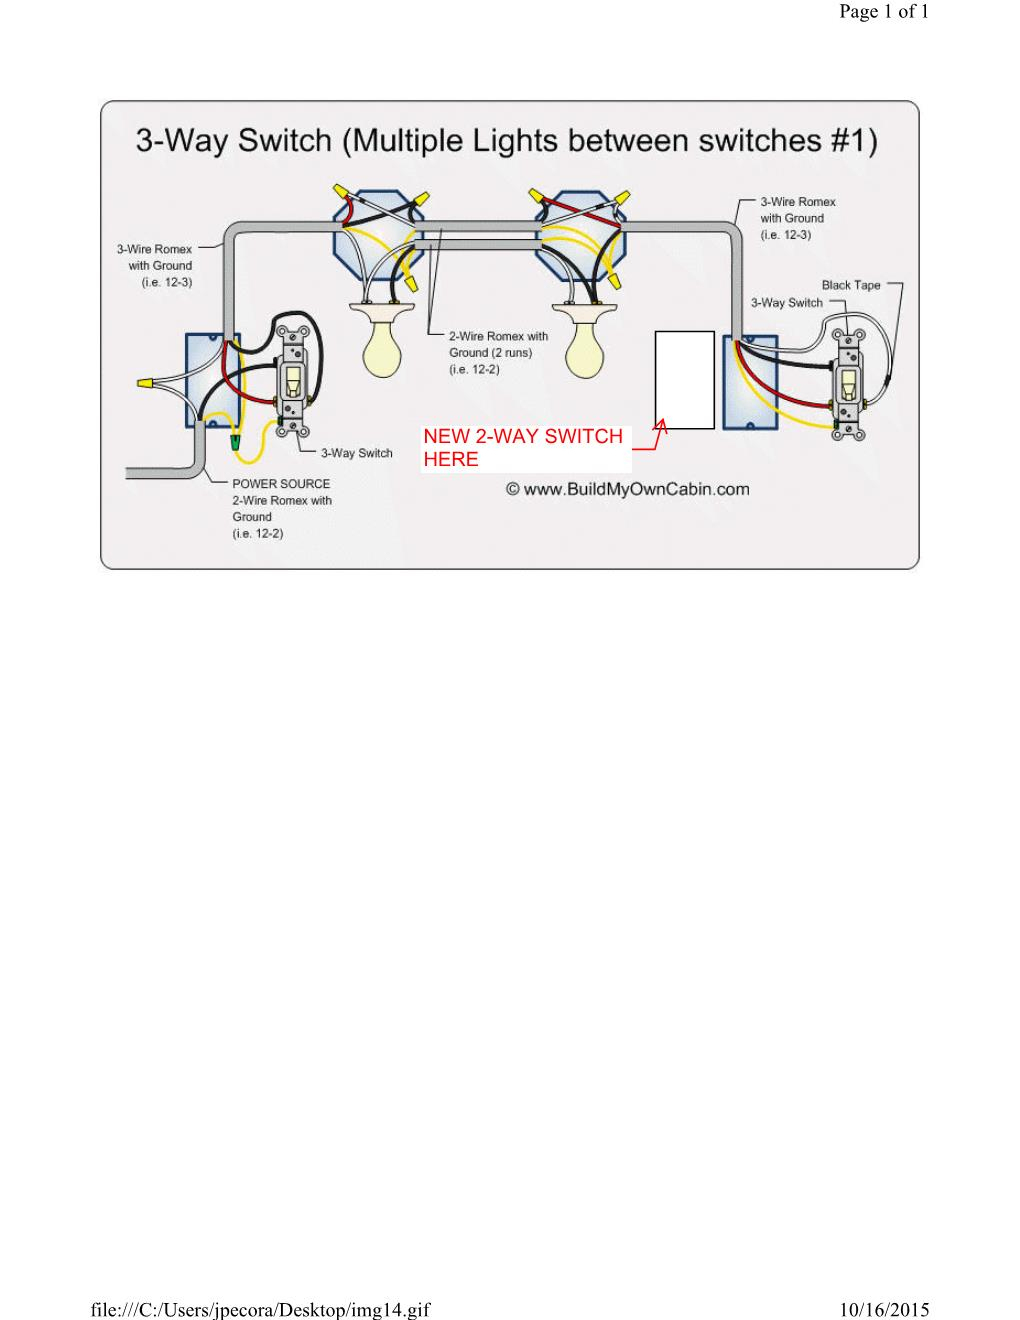 Wiring A Single Pole Switch Next To A 3-Way Switch - Home - 3 Pole Switch Wiring Diagram